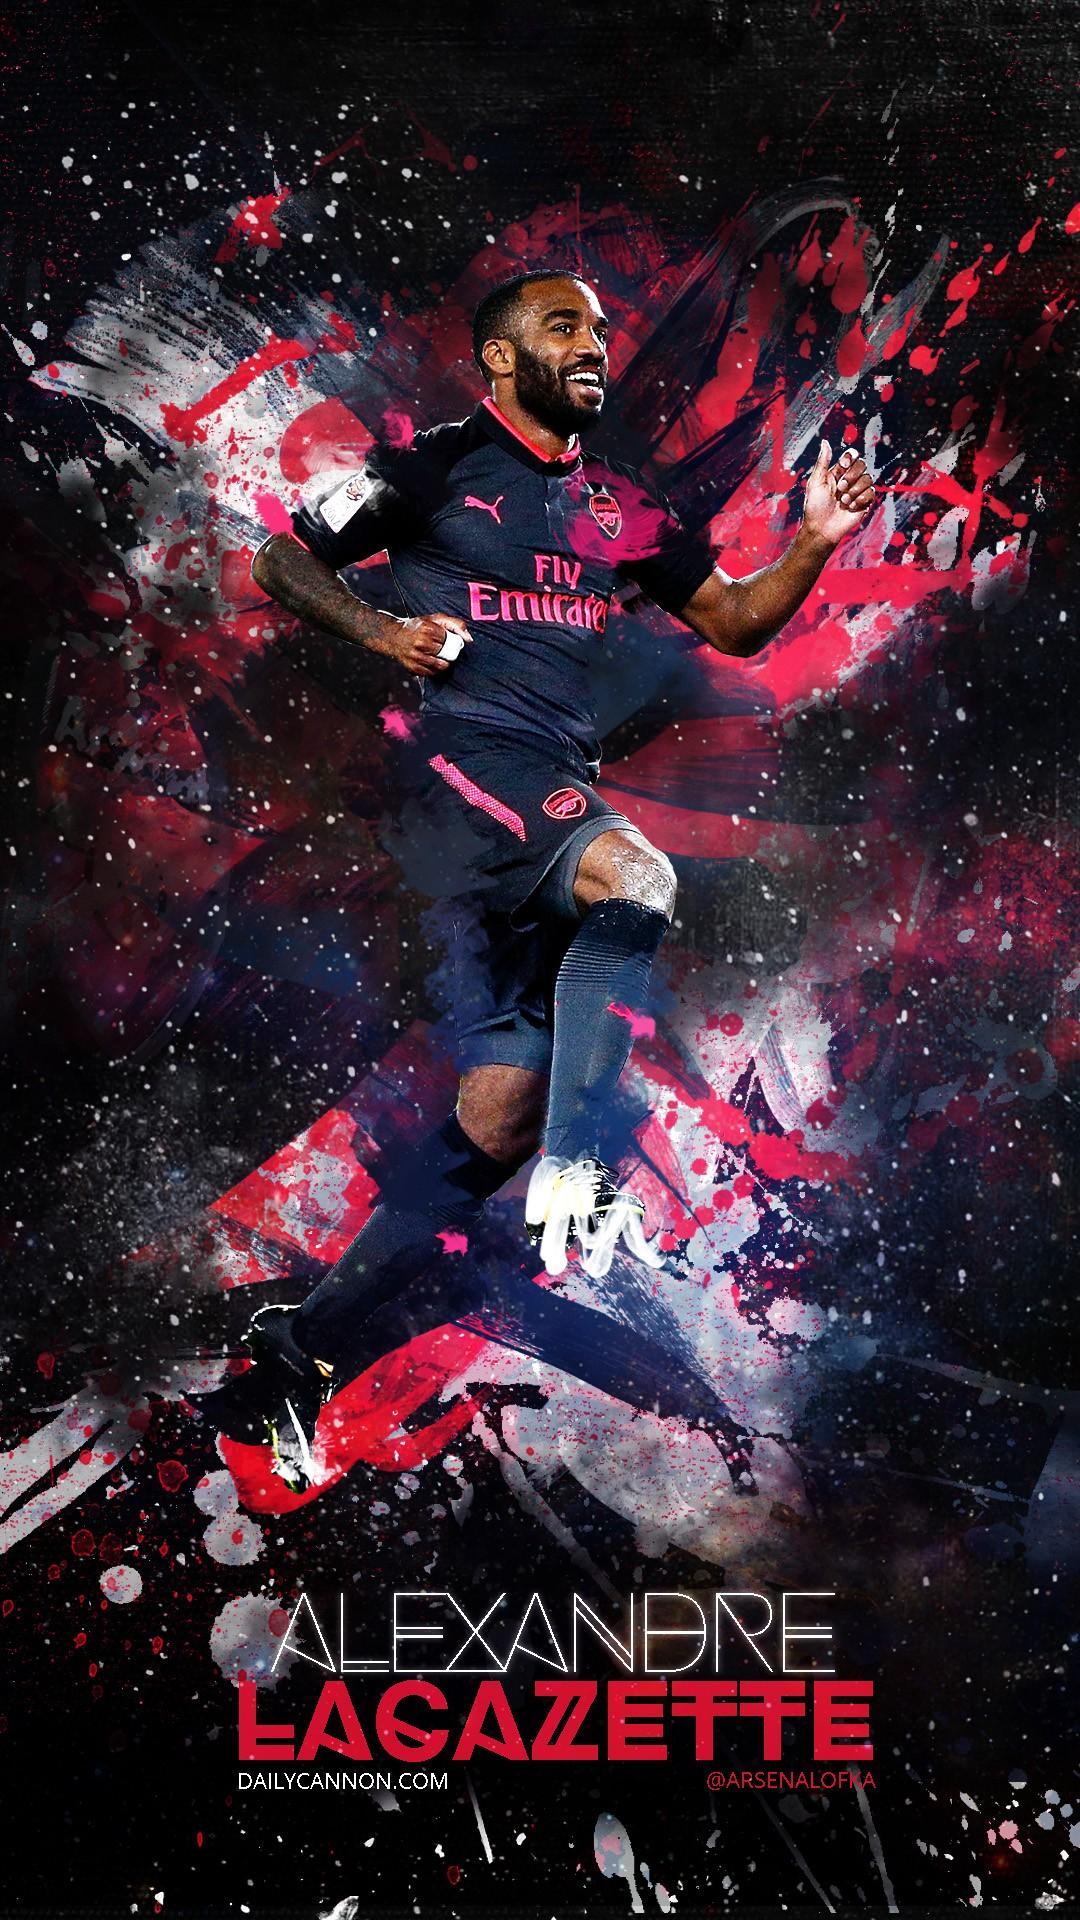 Alexandre Lacazette Arsenal iPhone Wallpaper 2020 3D iPhone 1080x1920